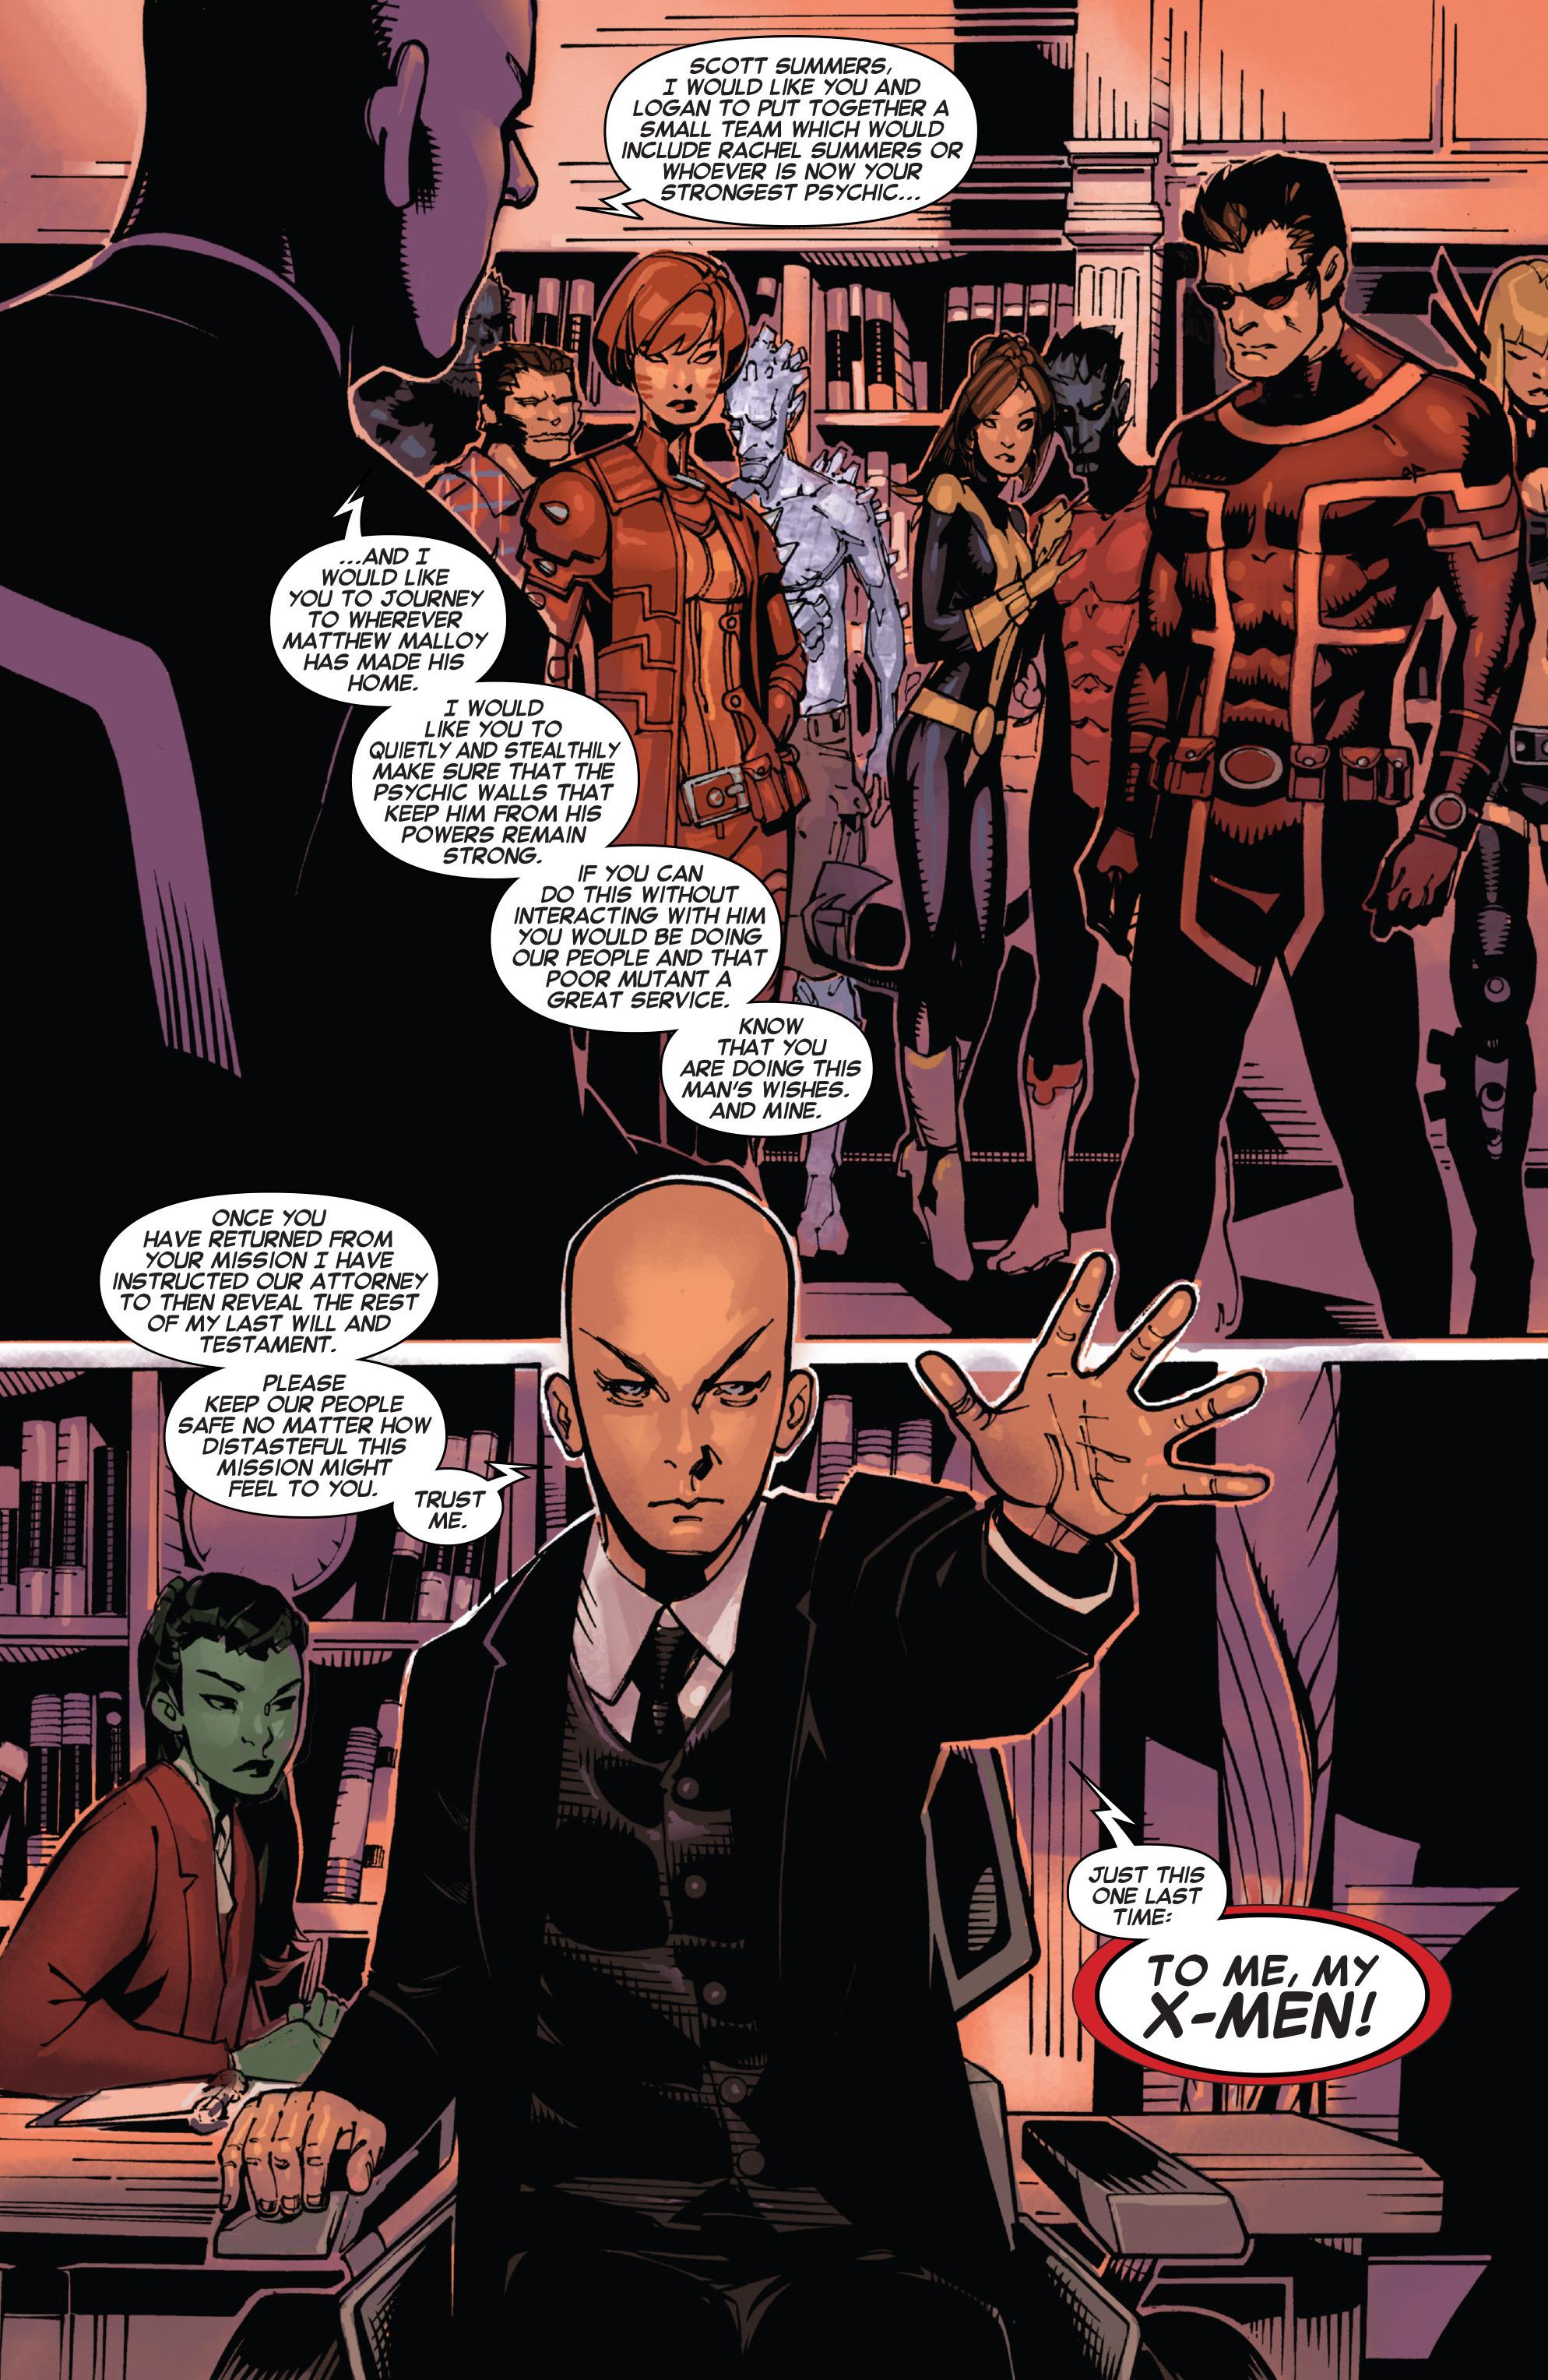 Read online Uncanny X-Men (2013) comic -  Issue # _TPB 4 - vs. S.H.I.E.L.D - 142